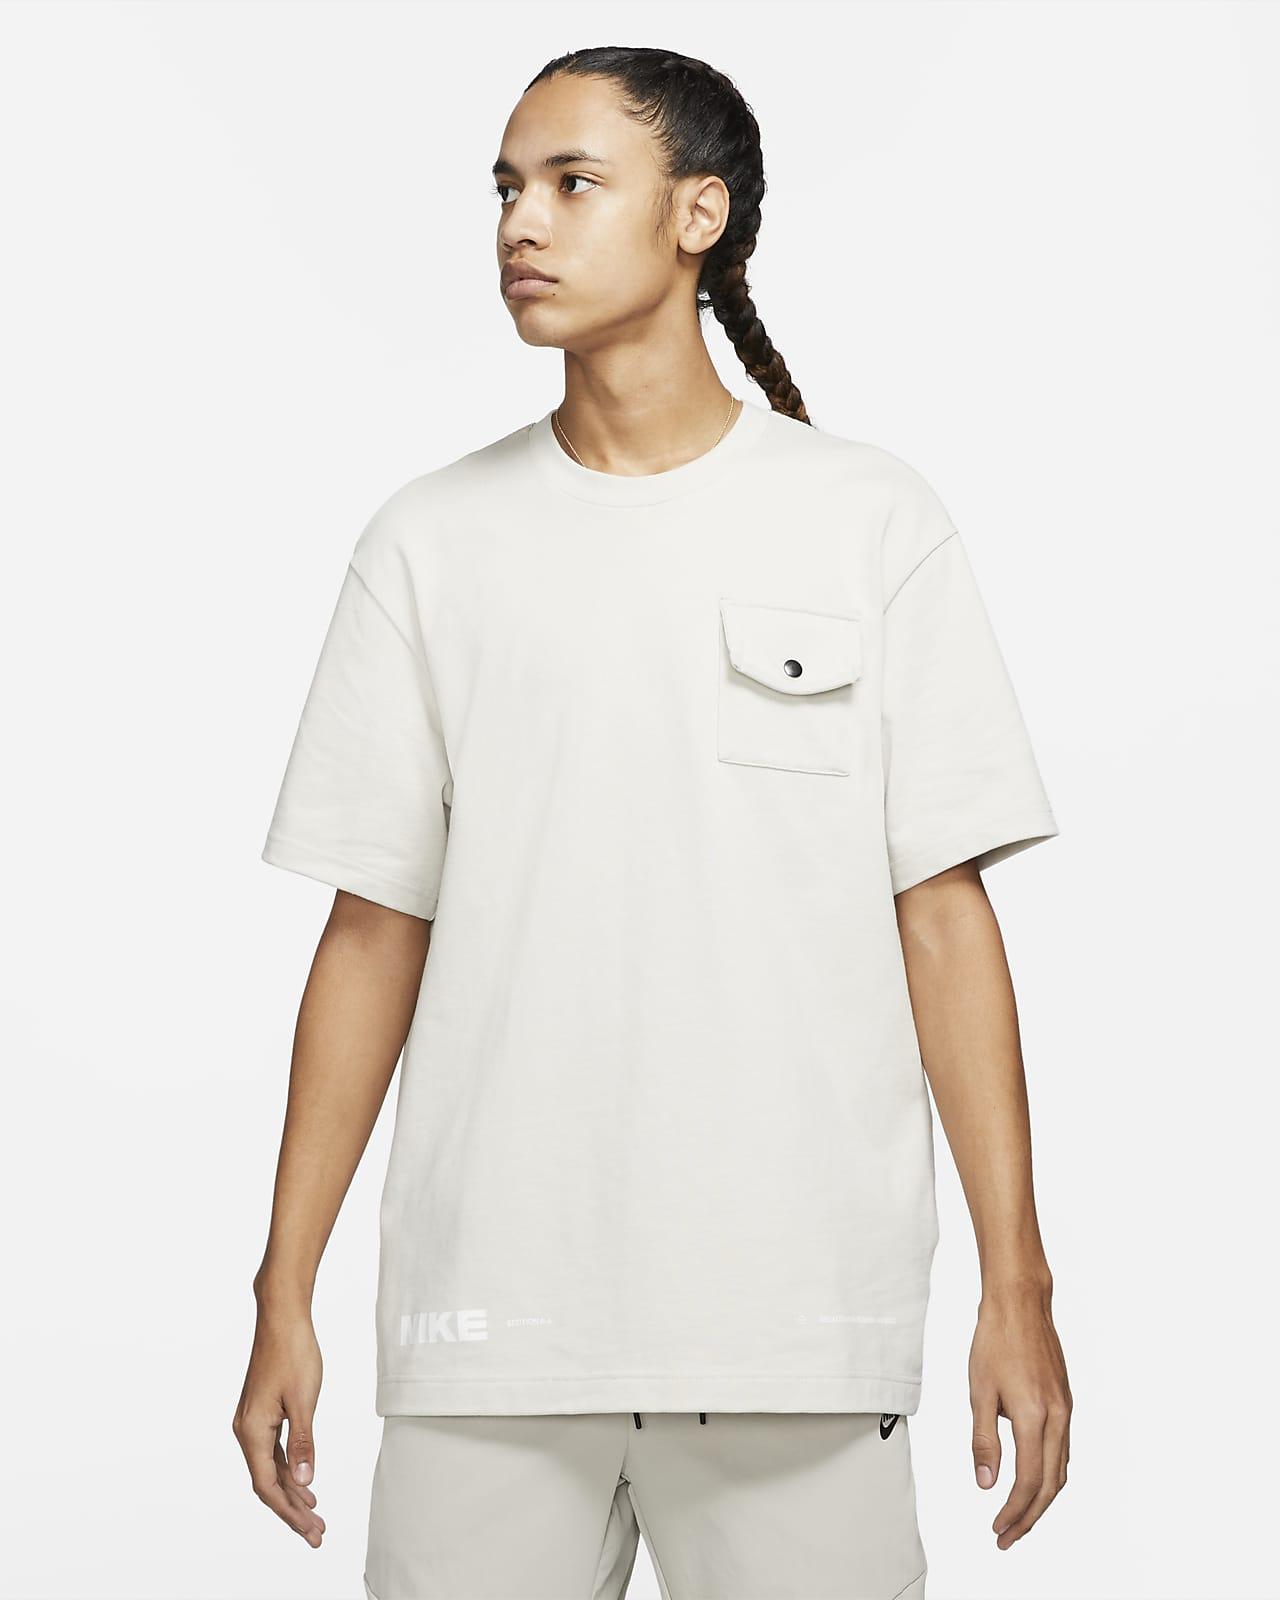 Nike Sportswear City Made rövid ujjú férfifelső